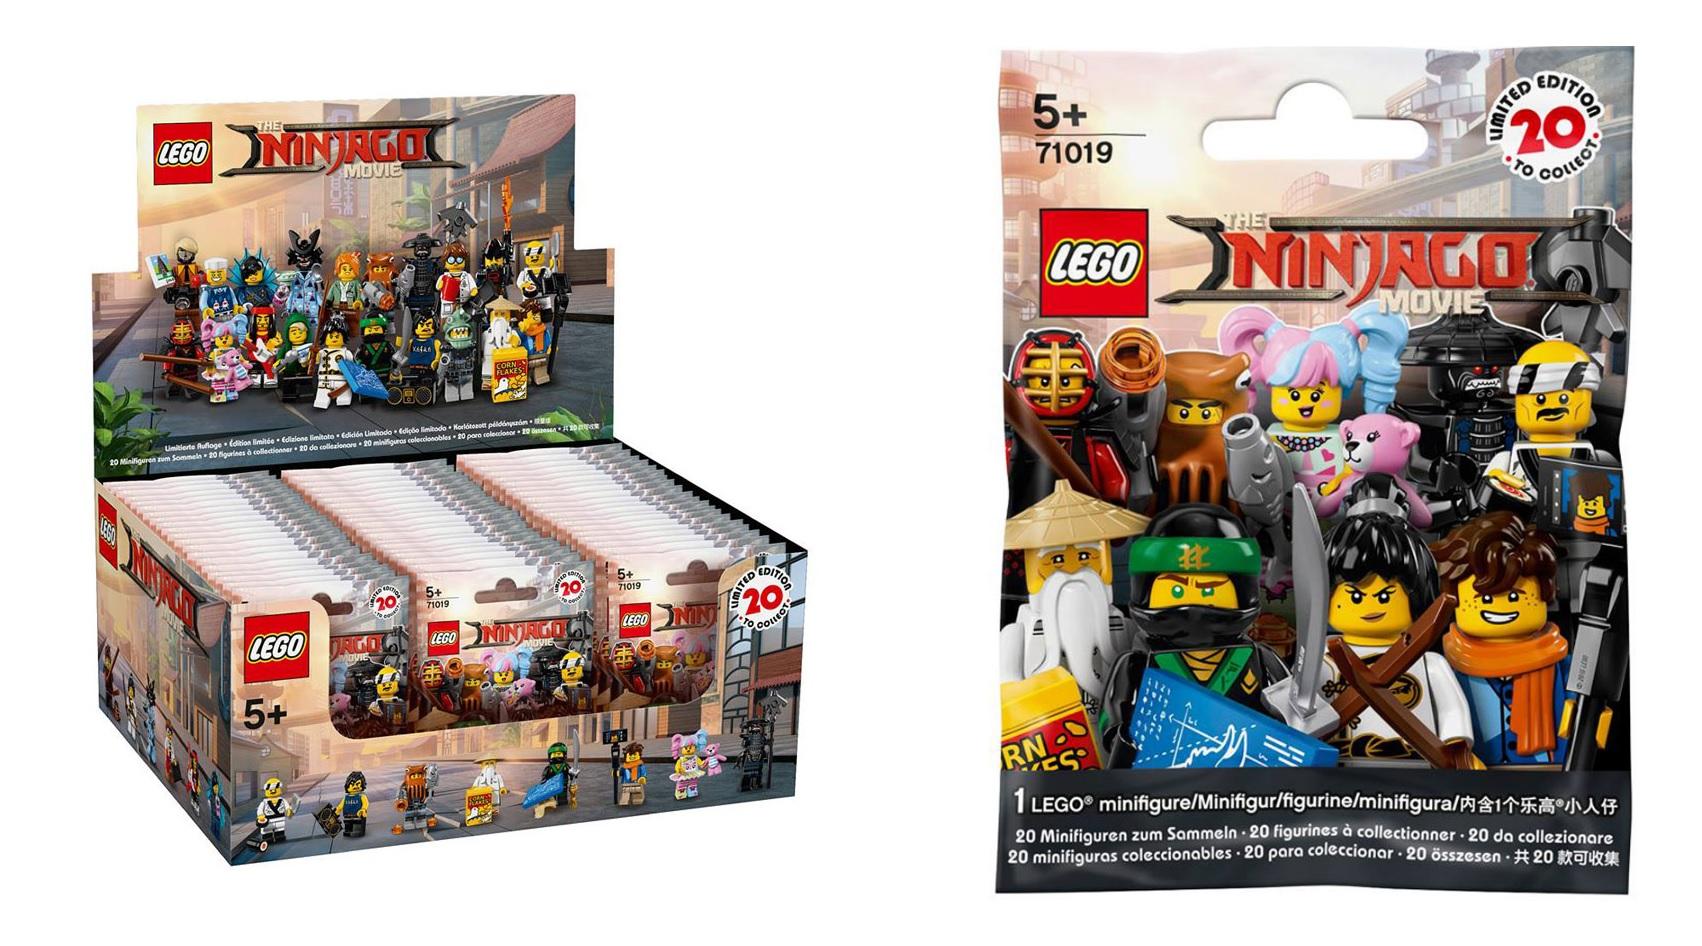 Lego Ninjago Movie Collectable Series Minifigures 71019 Toys N Bricks Lego News Blog